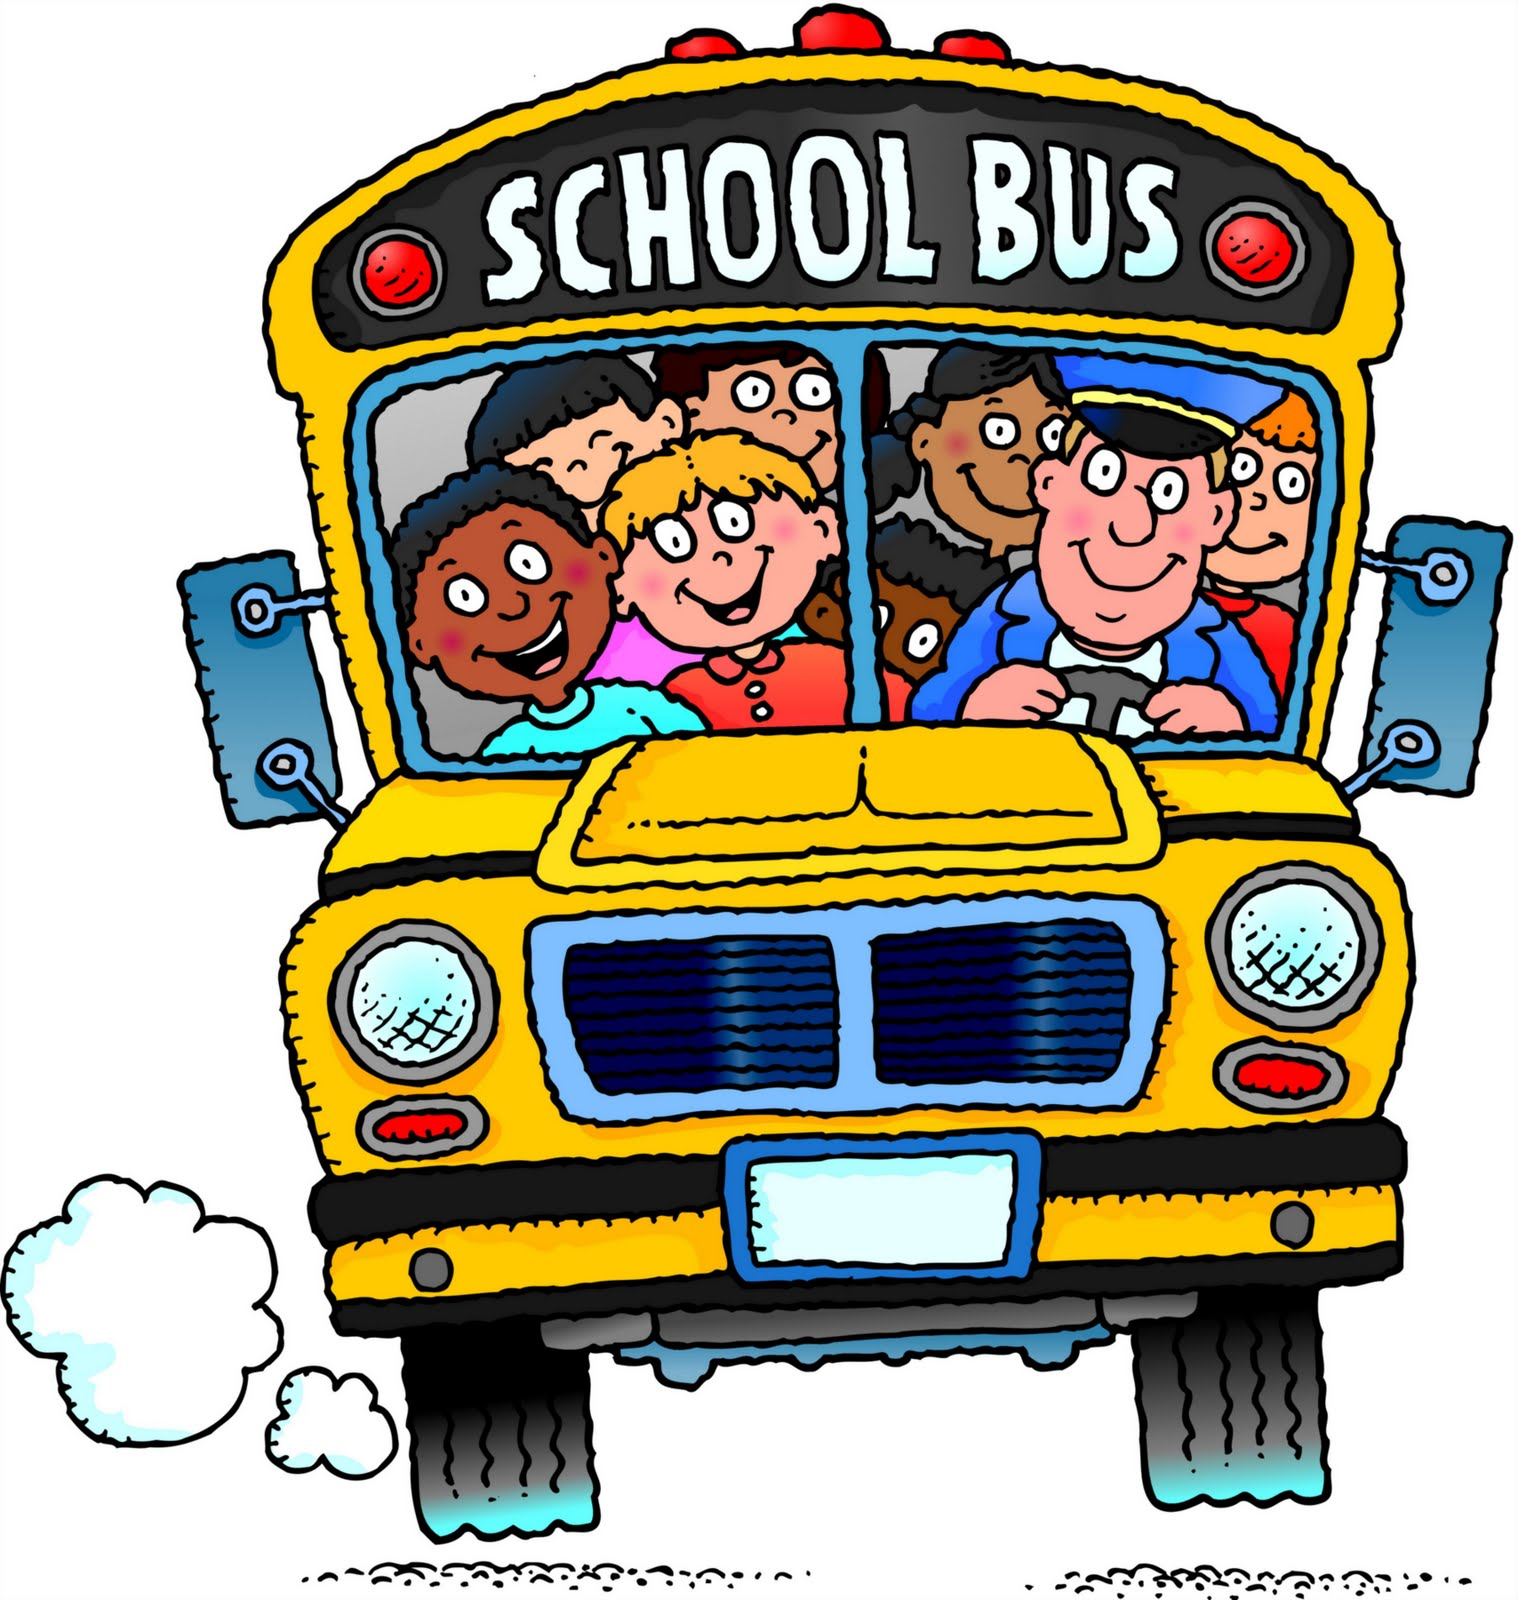 School bus image clipart-School bus image clipart-16